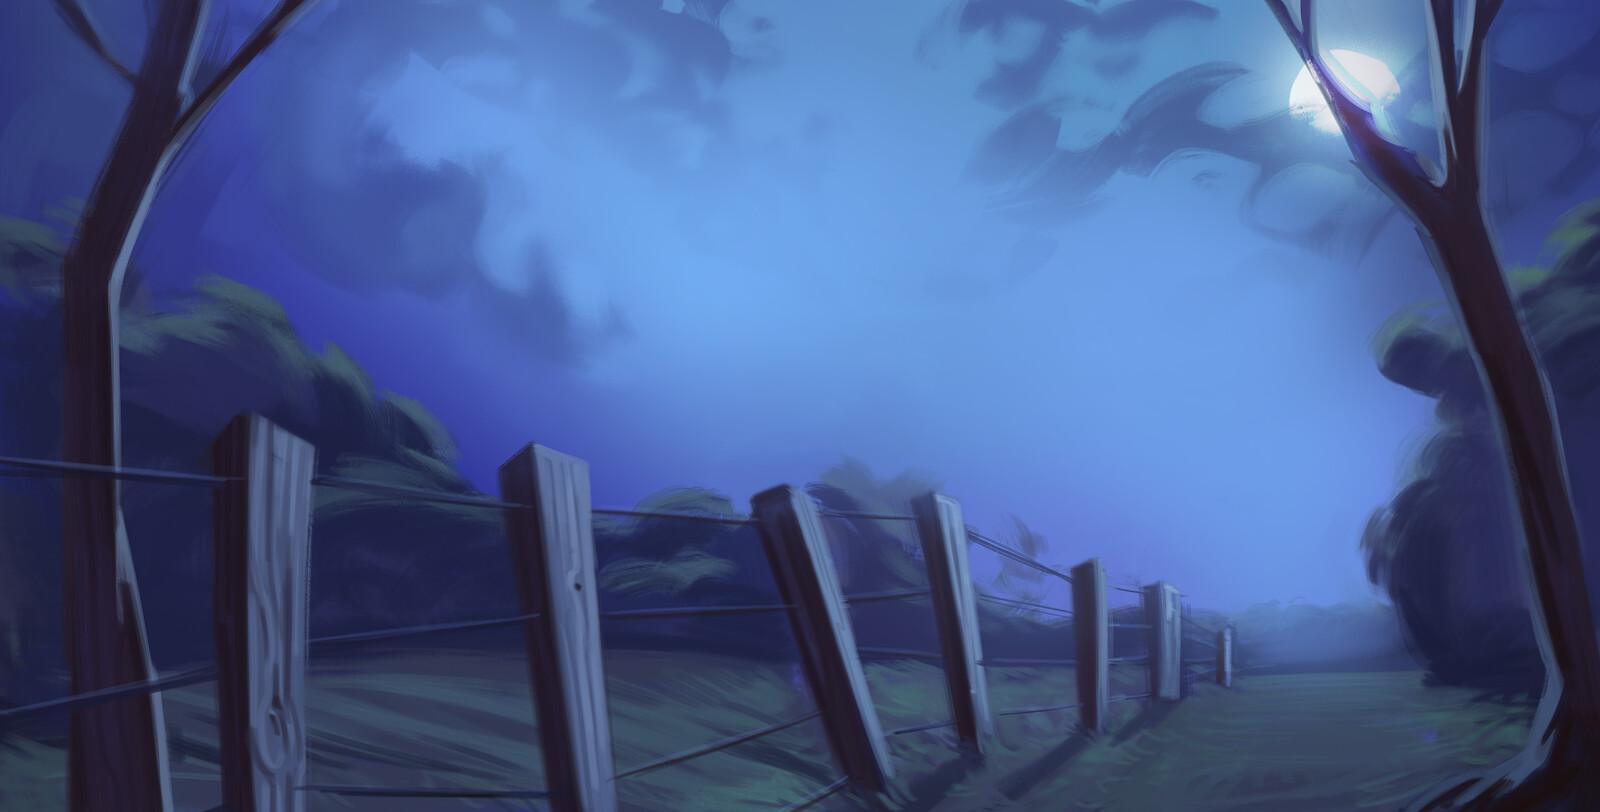 BG extension for animation